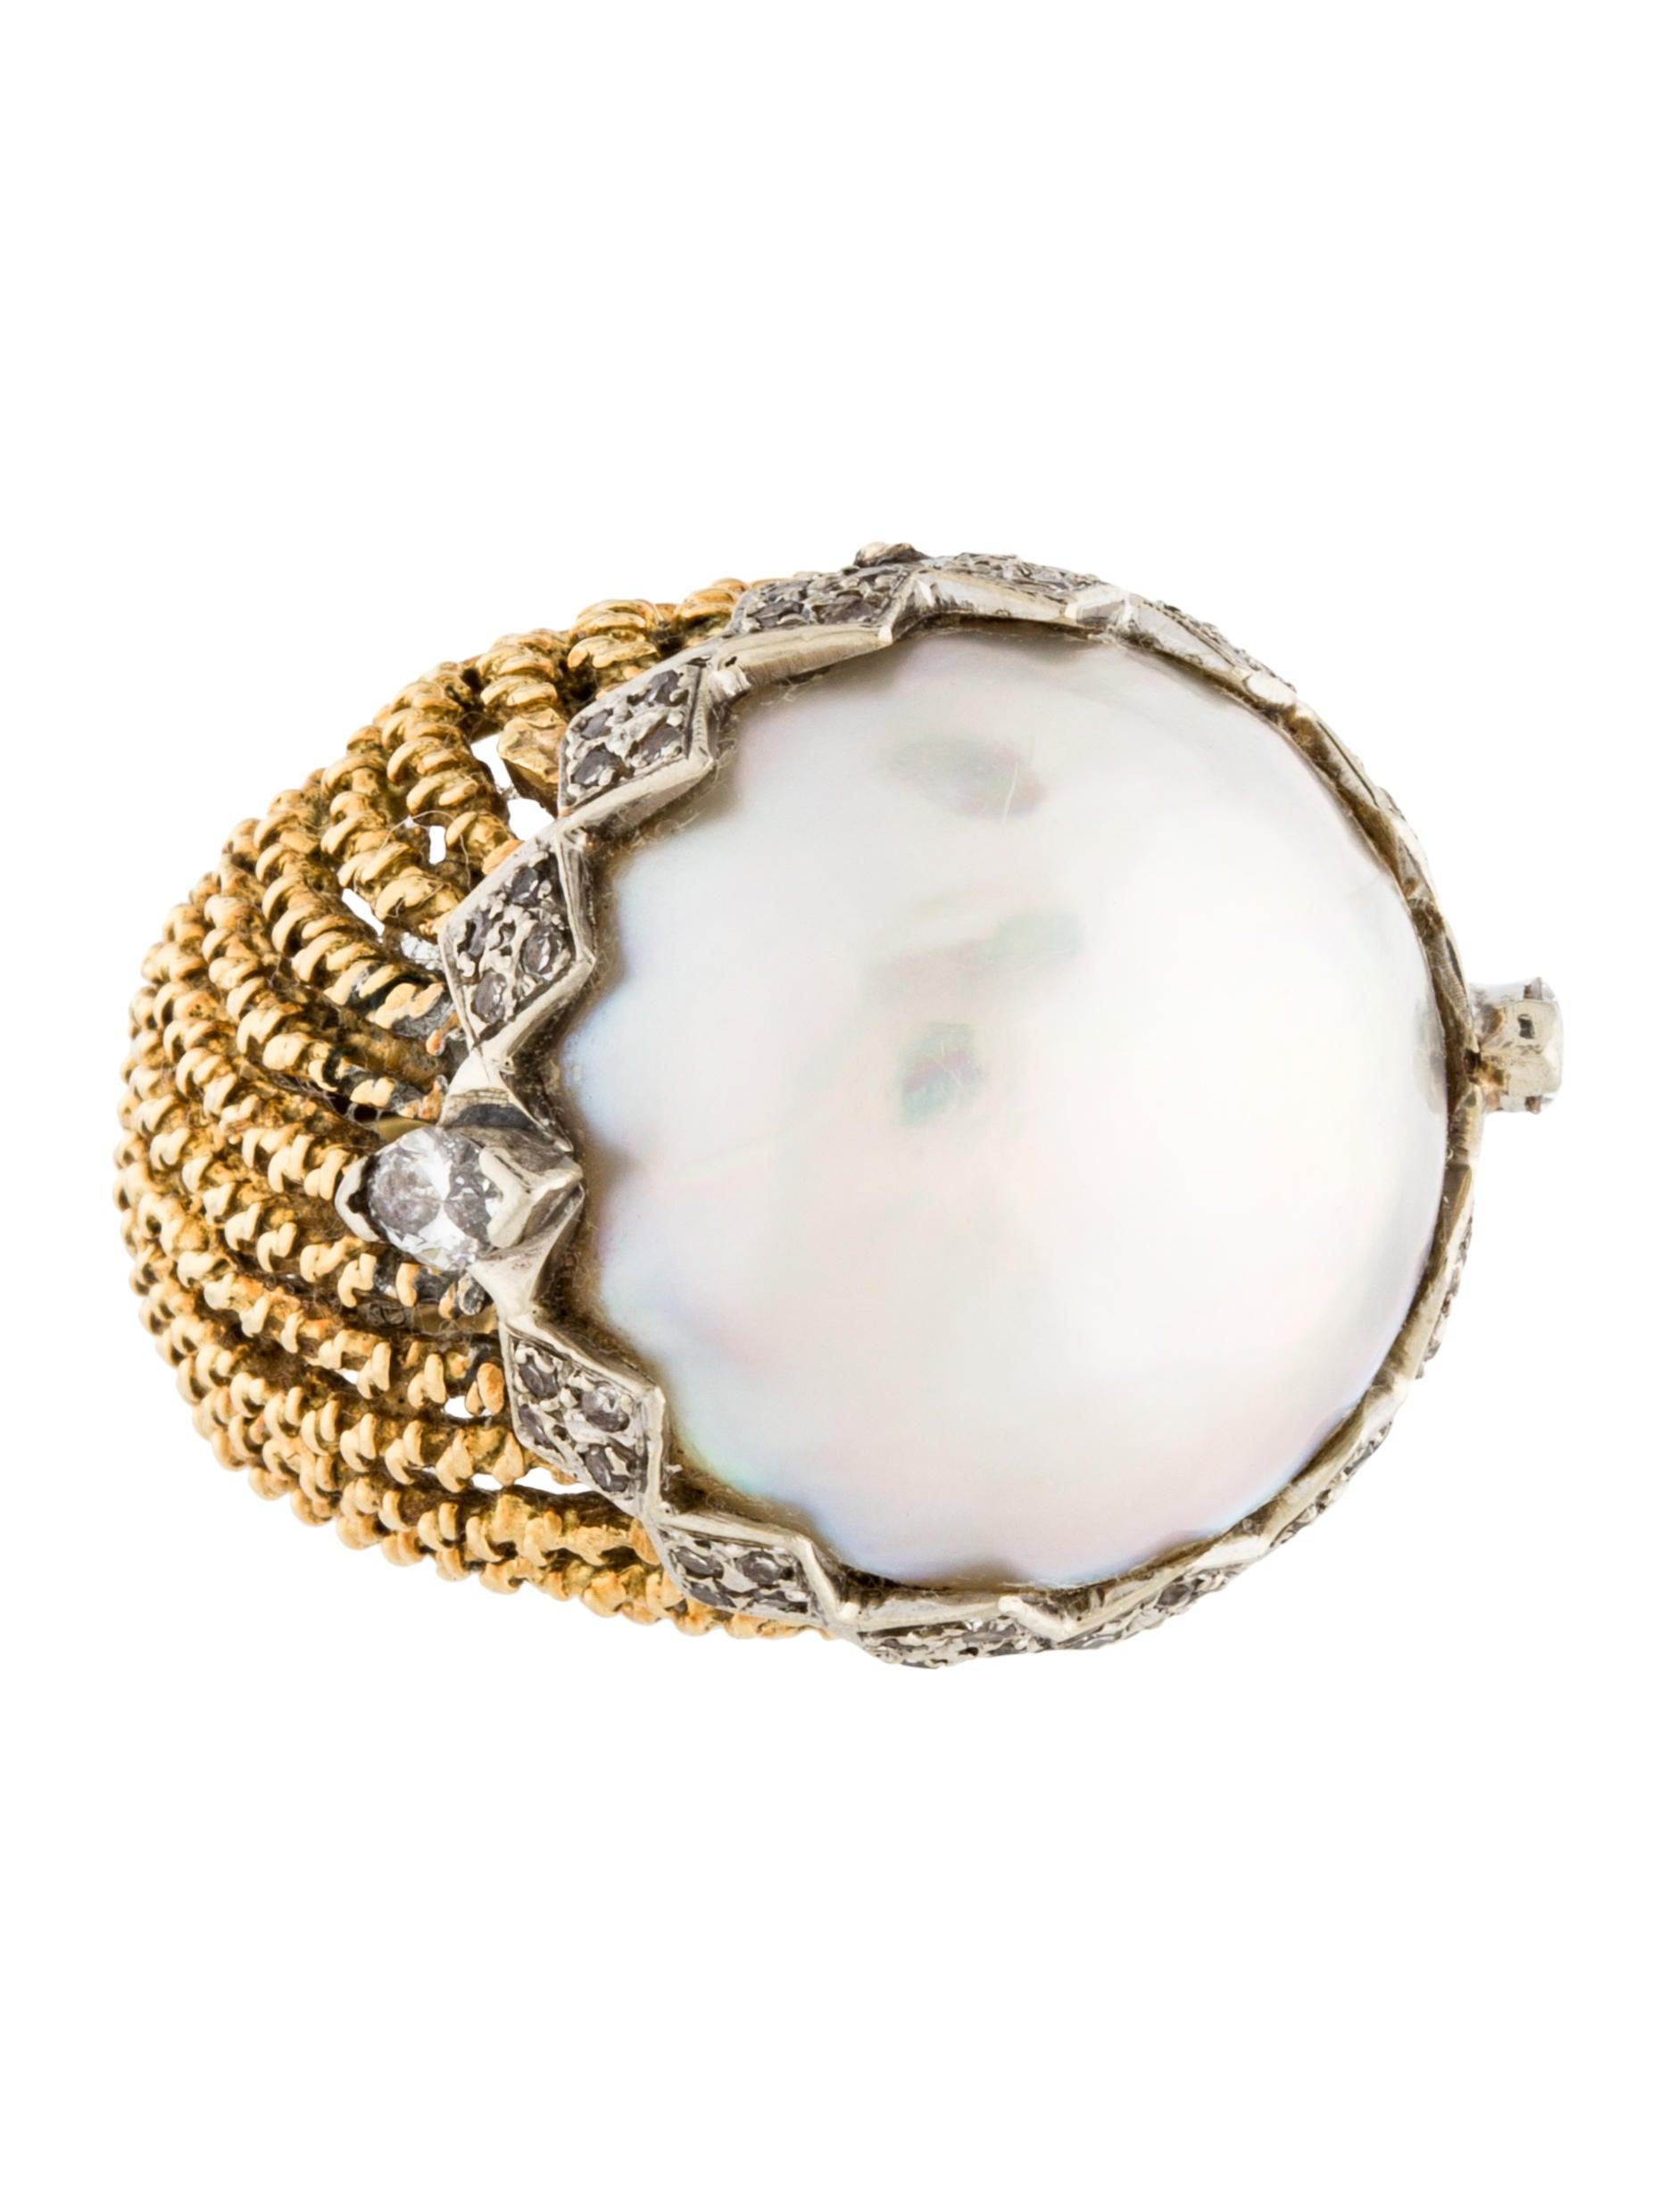 18k diamond pearl cocktail ring rings rring39793. Black Bedroom Furniture Sets. Home Design Ideas